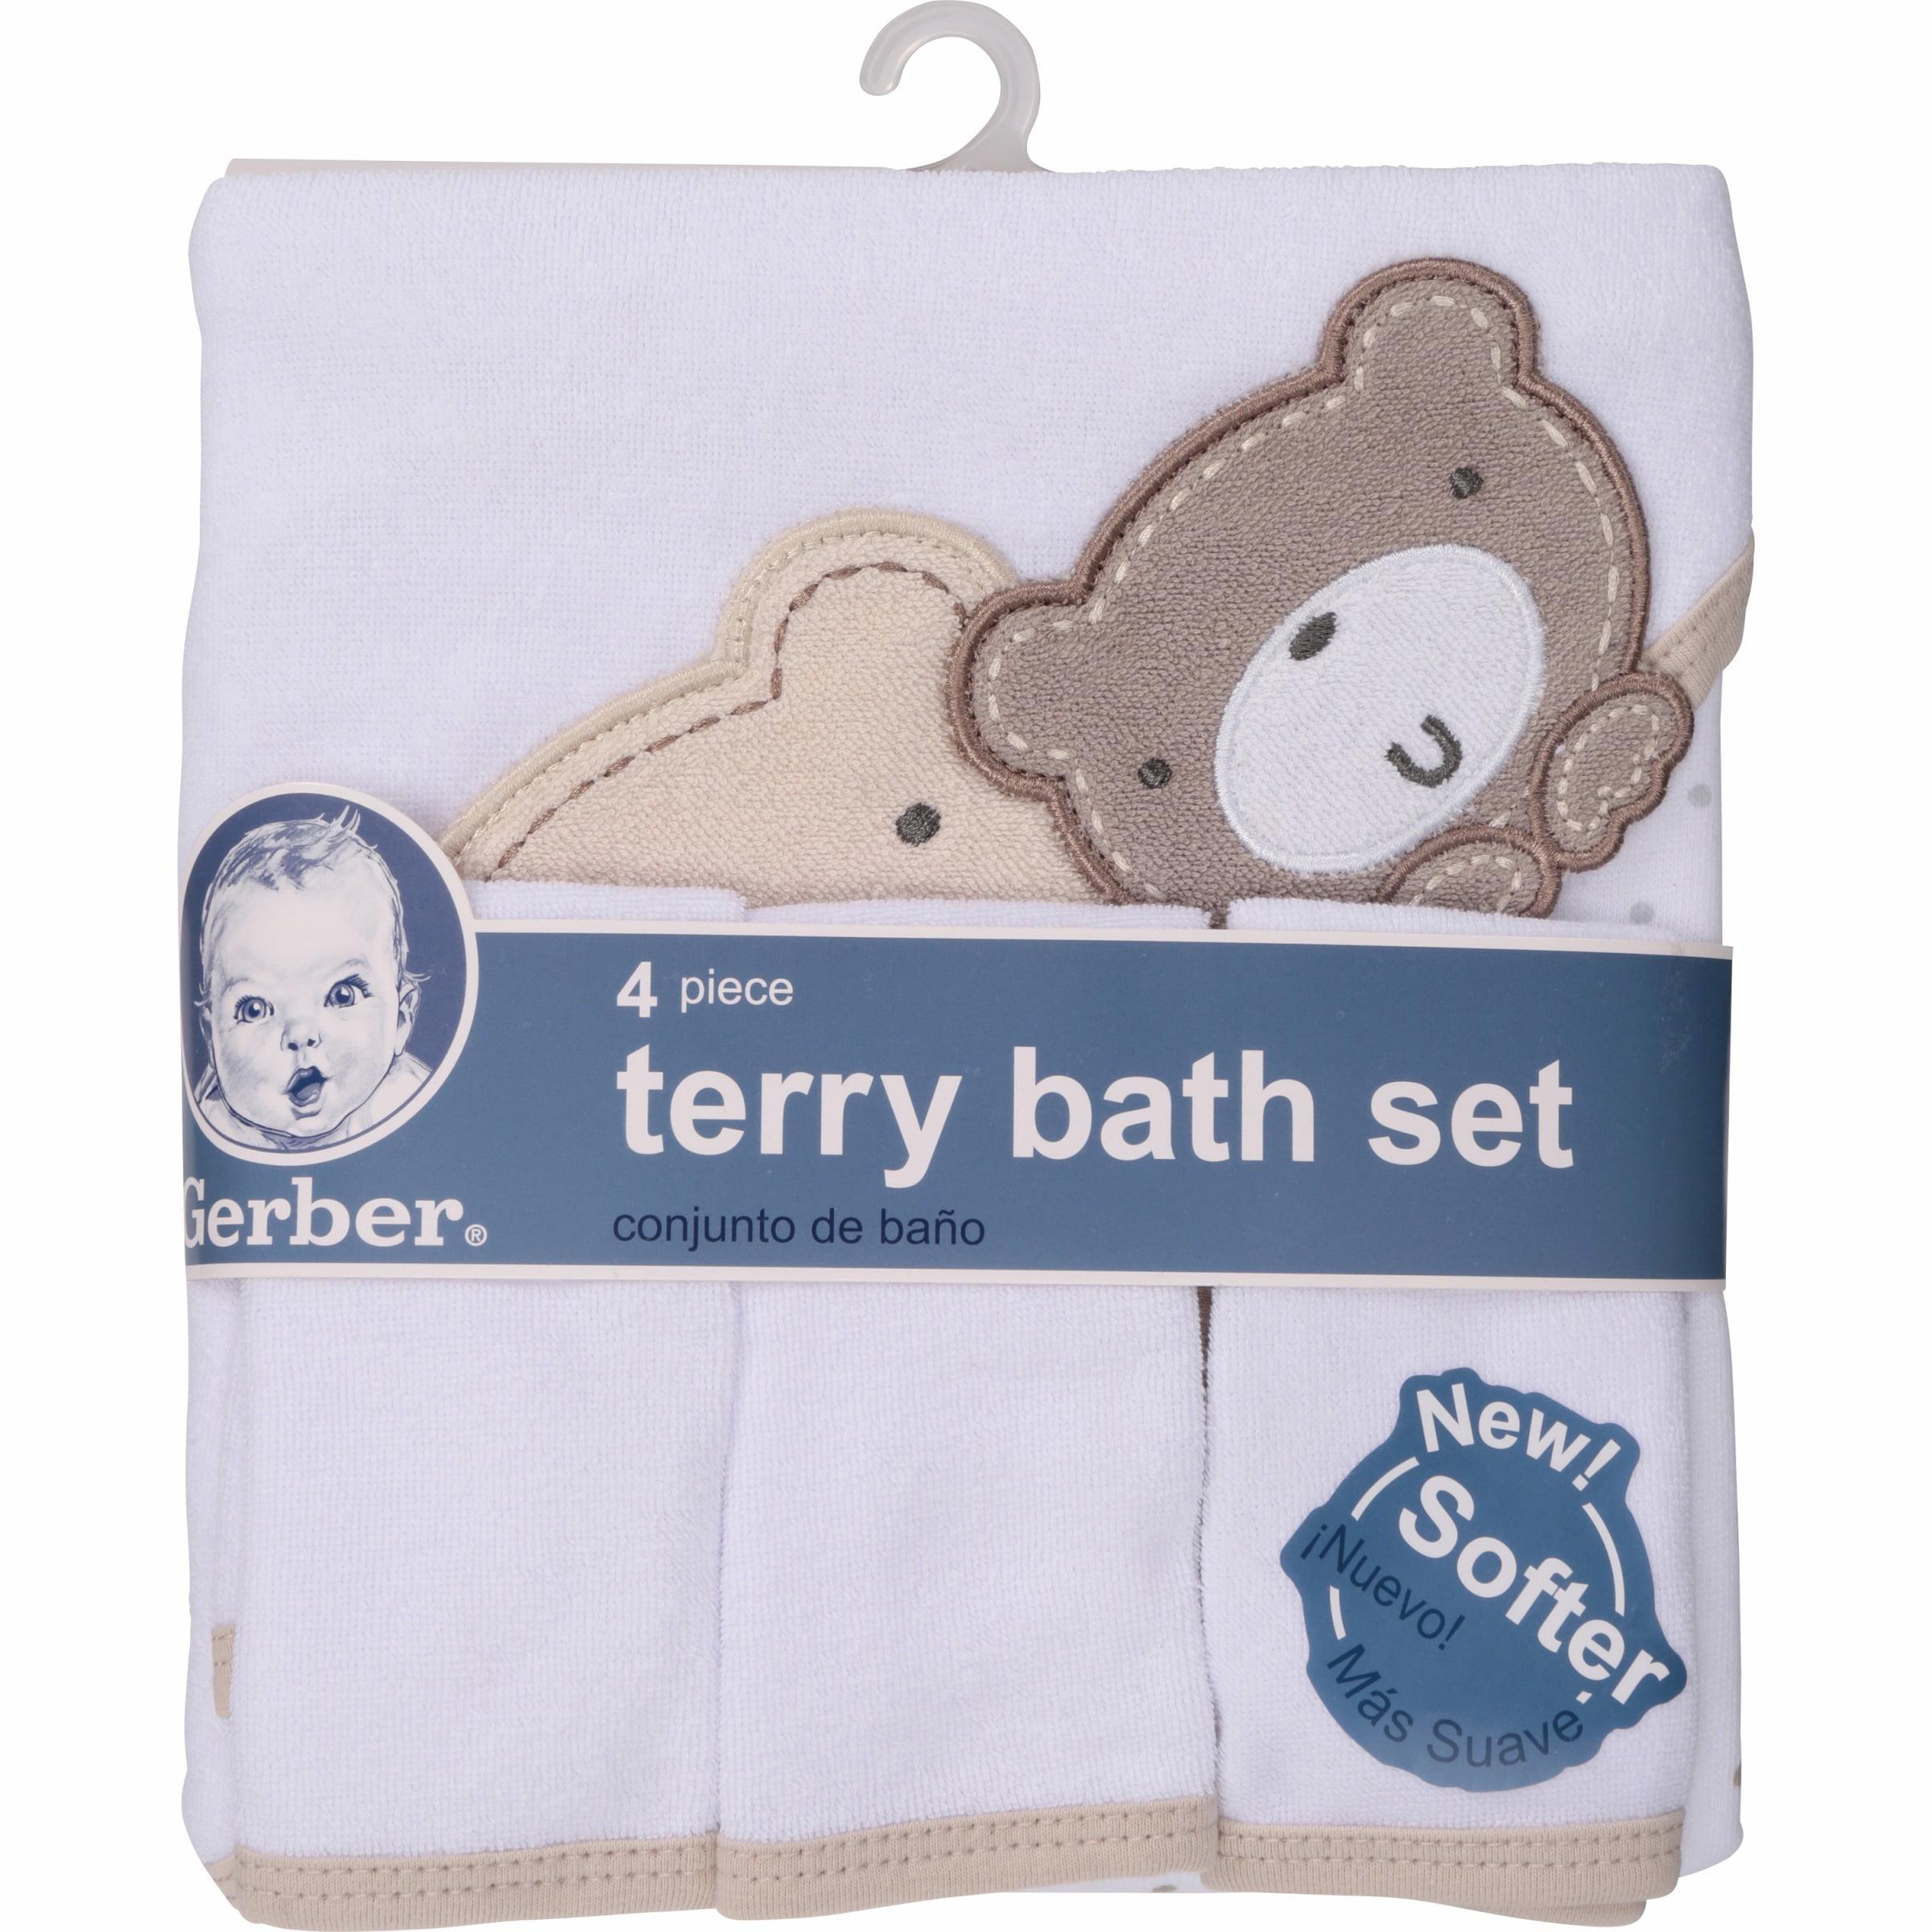 8fcc0c7245f0 Gerber Newborn Baby Towel and Washcloths Bath Gift Set, Bears, 4 Piece -  Walmart.com